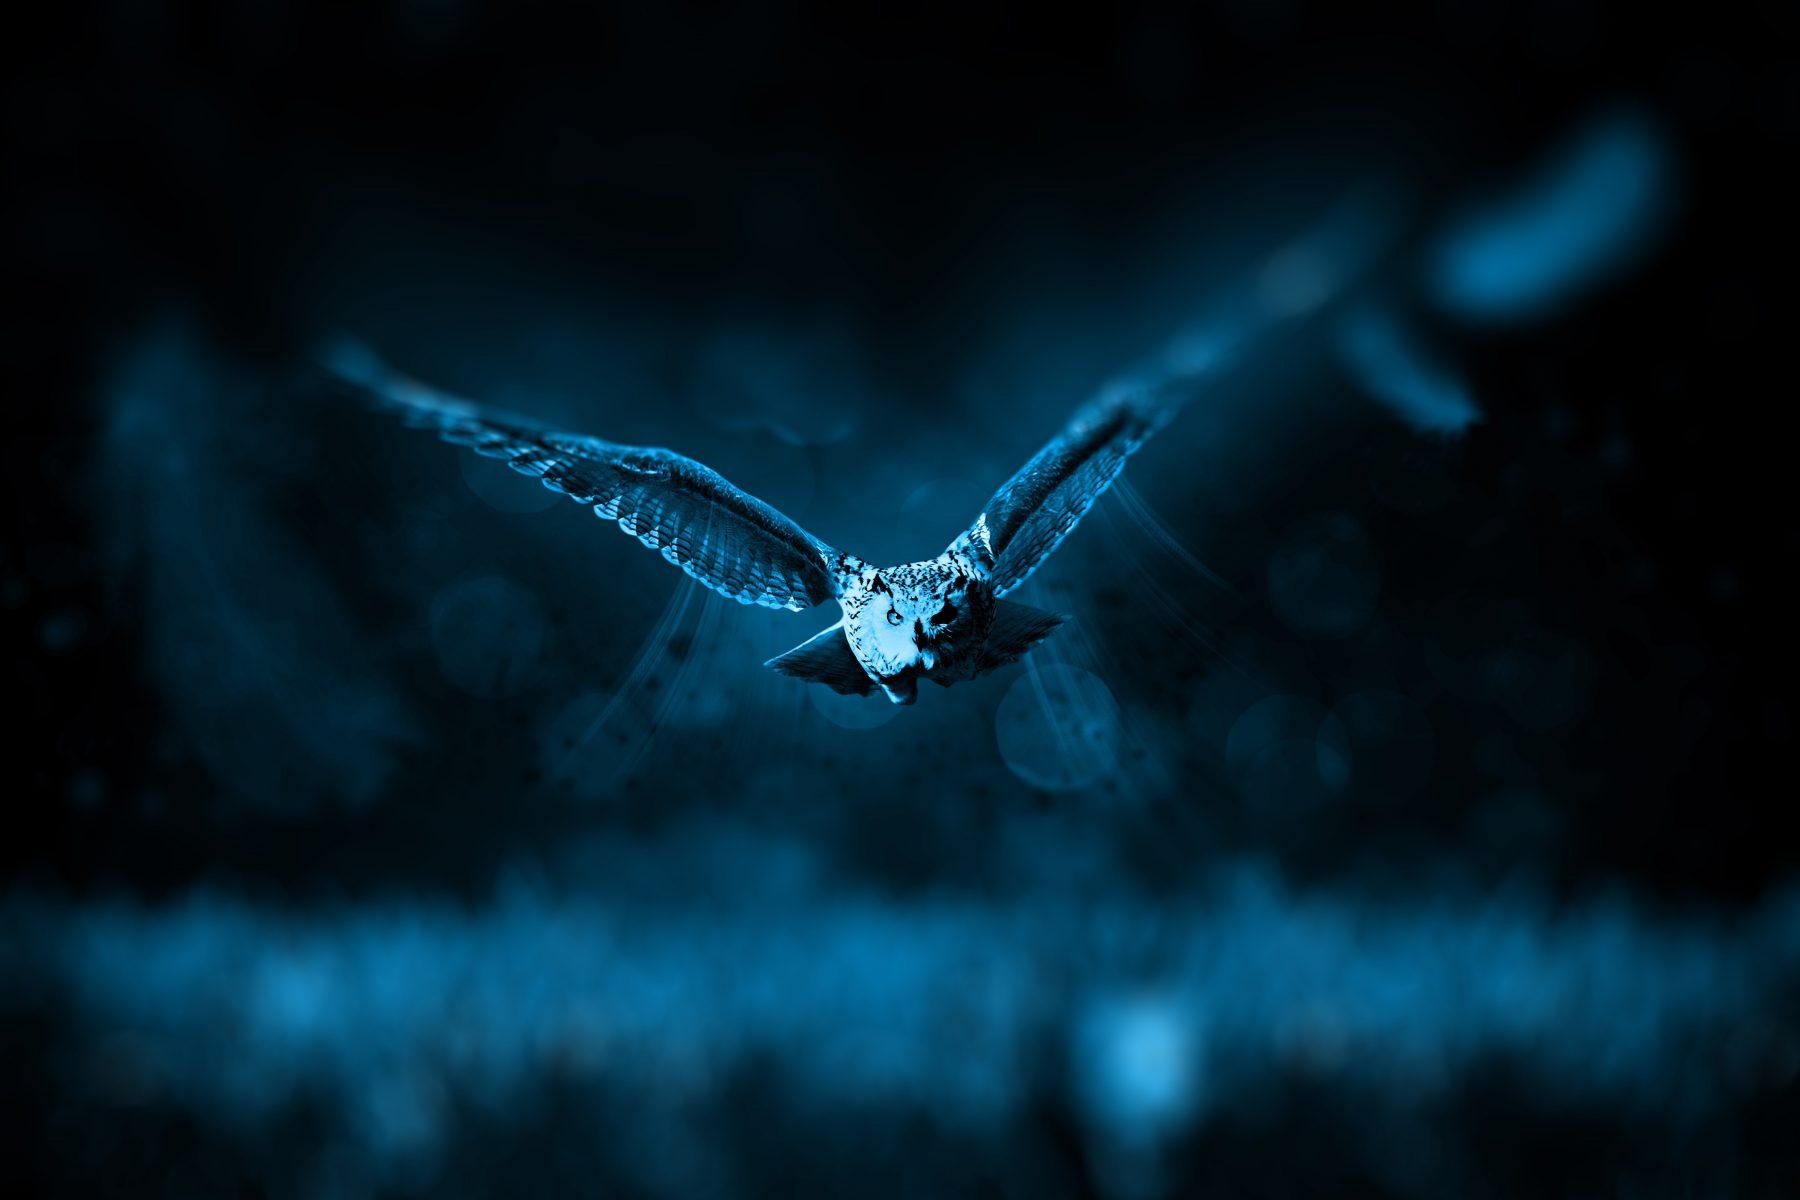 animal-bird-dark-46248